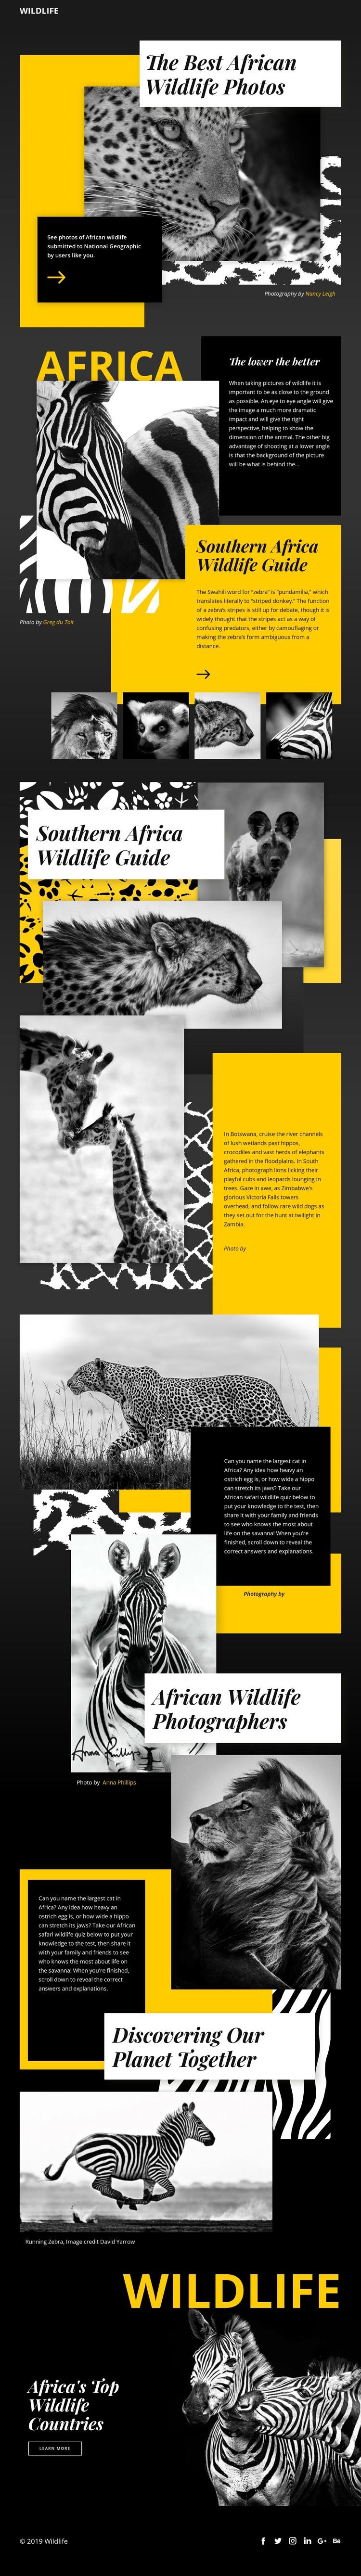 Wildlife Photos CSS Template